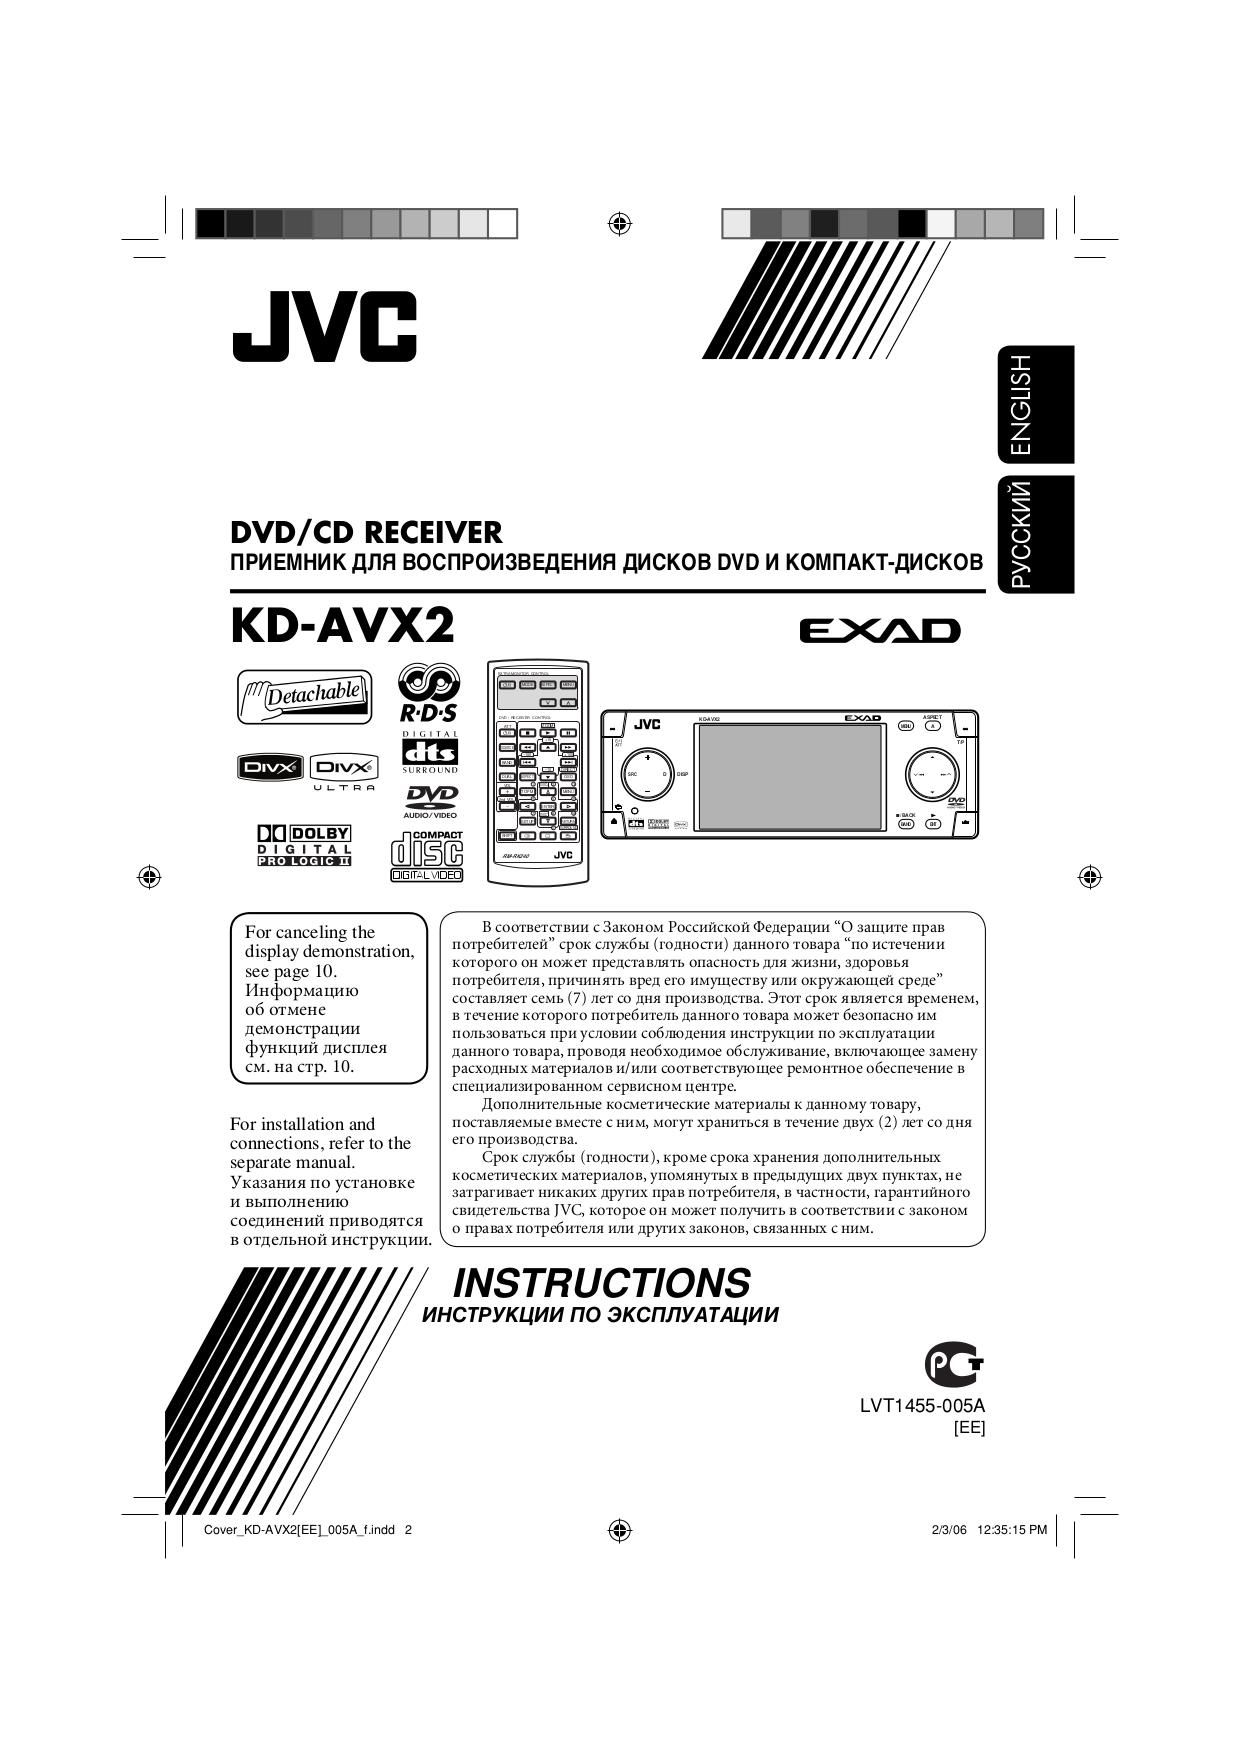 Jvc Avx2 Manual Wiring Diagrams Car Stereo Hd Radio R320 Diagram Pdf For Receiver Kd